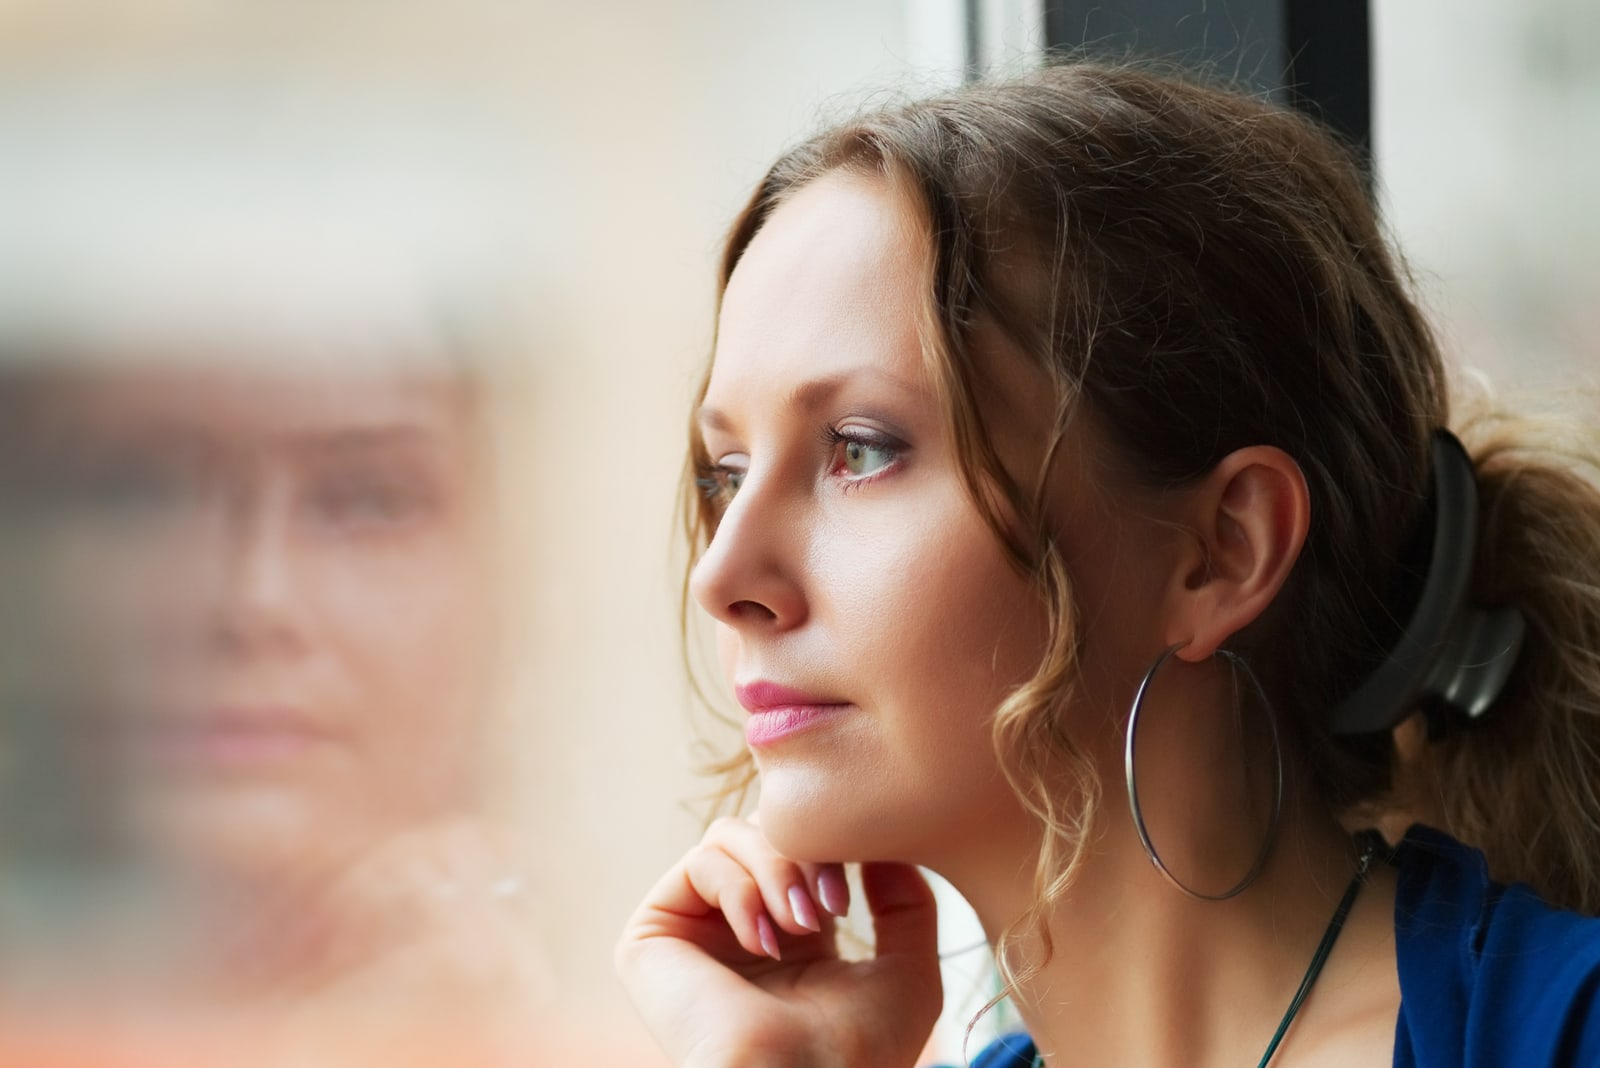 Sad beautiful woman looking through a window